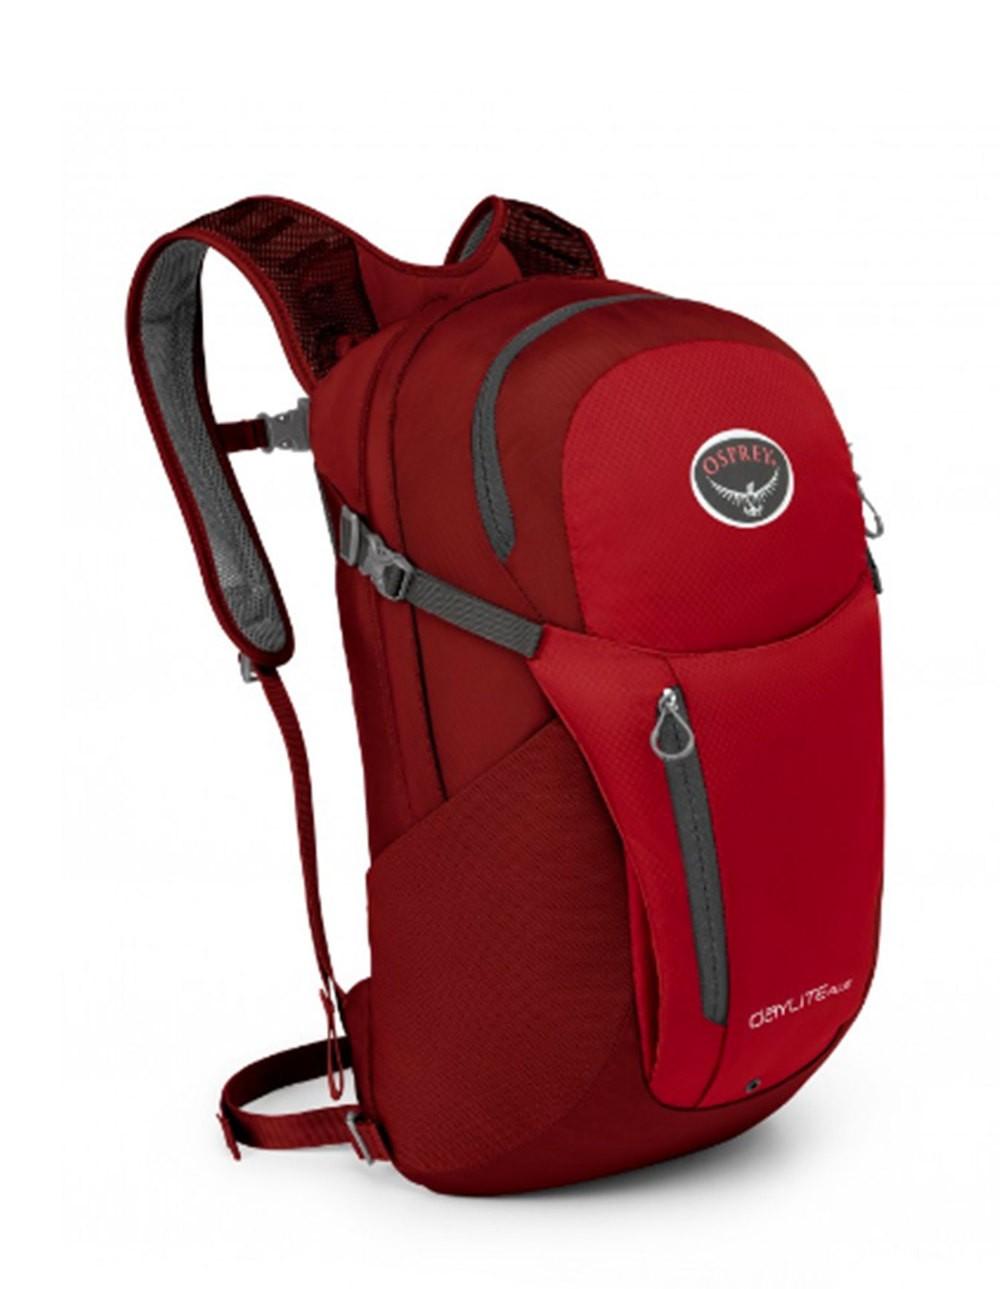 Osprey Sac à dos de randonnée - Daylite Plus Real Red 20L